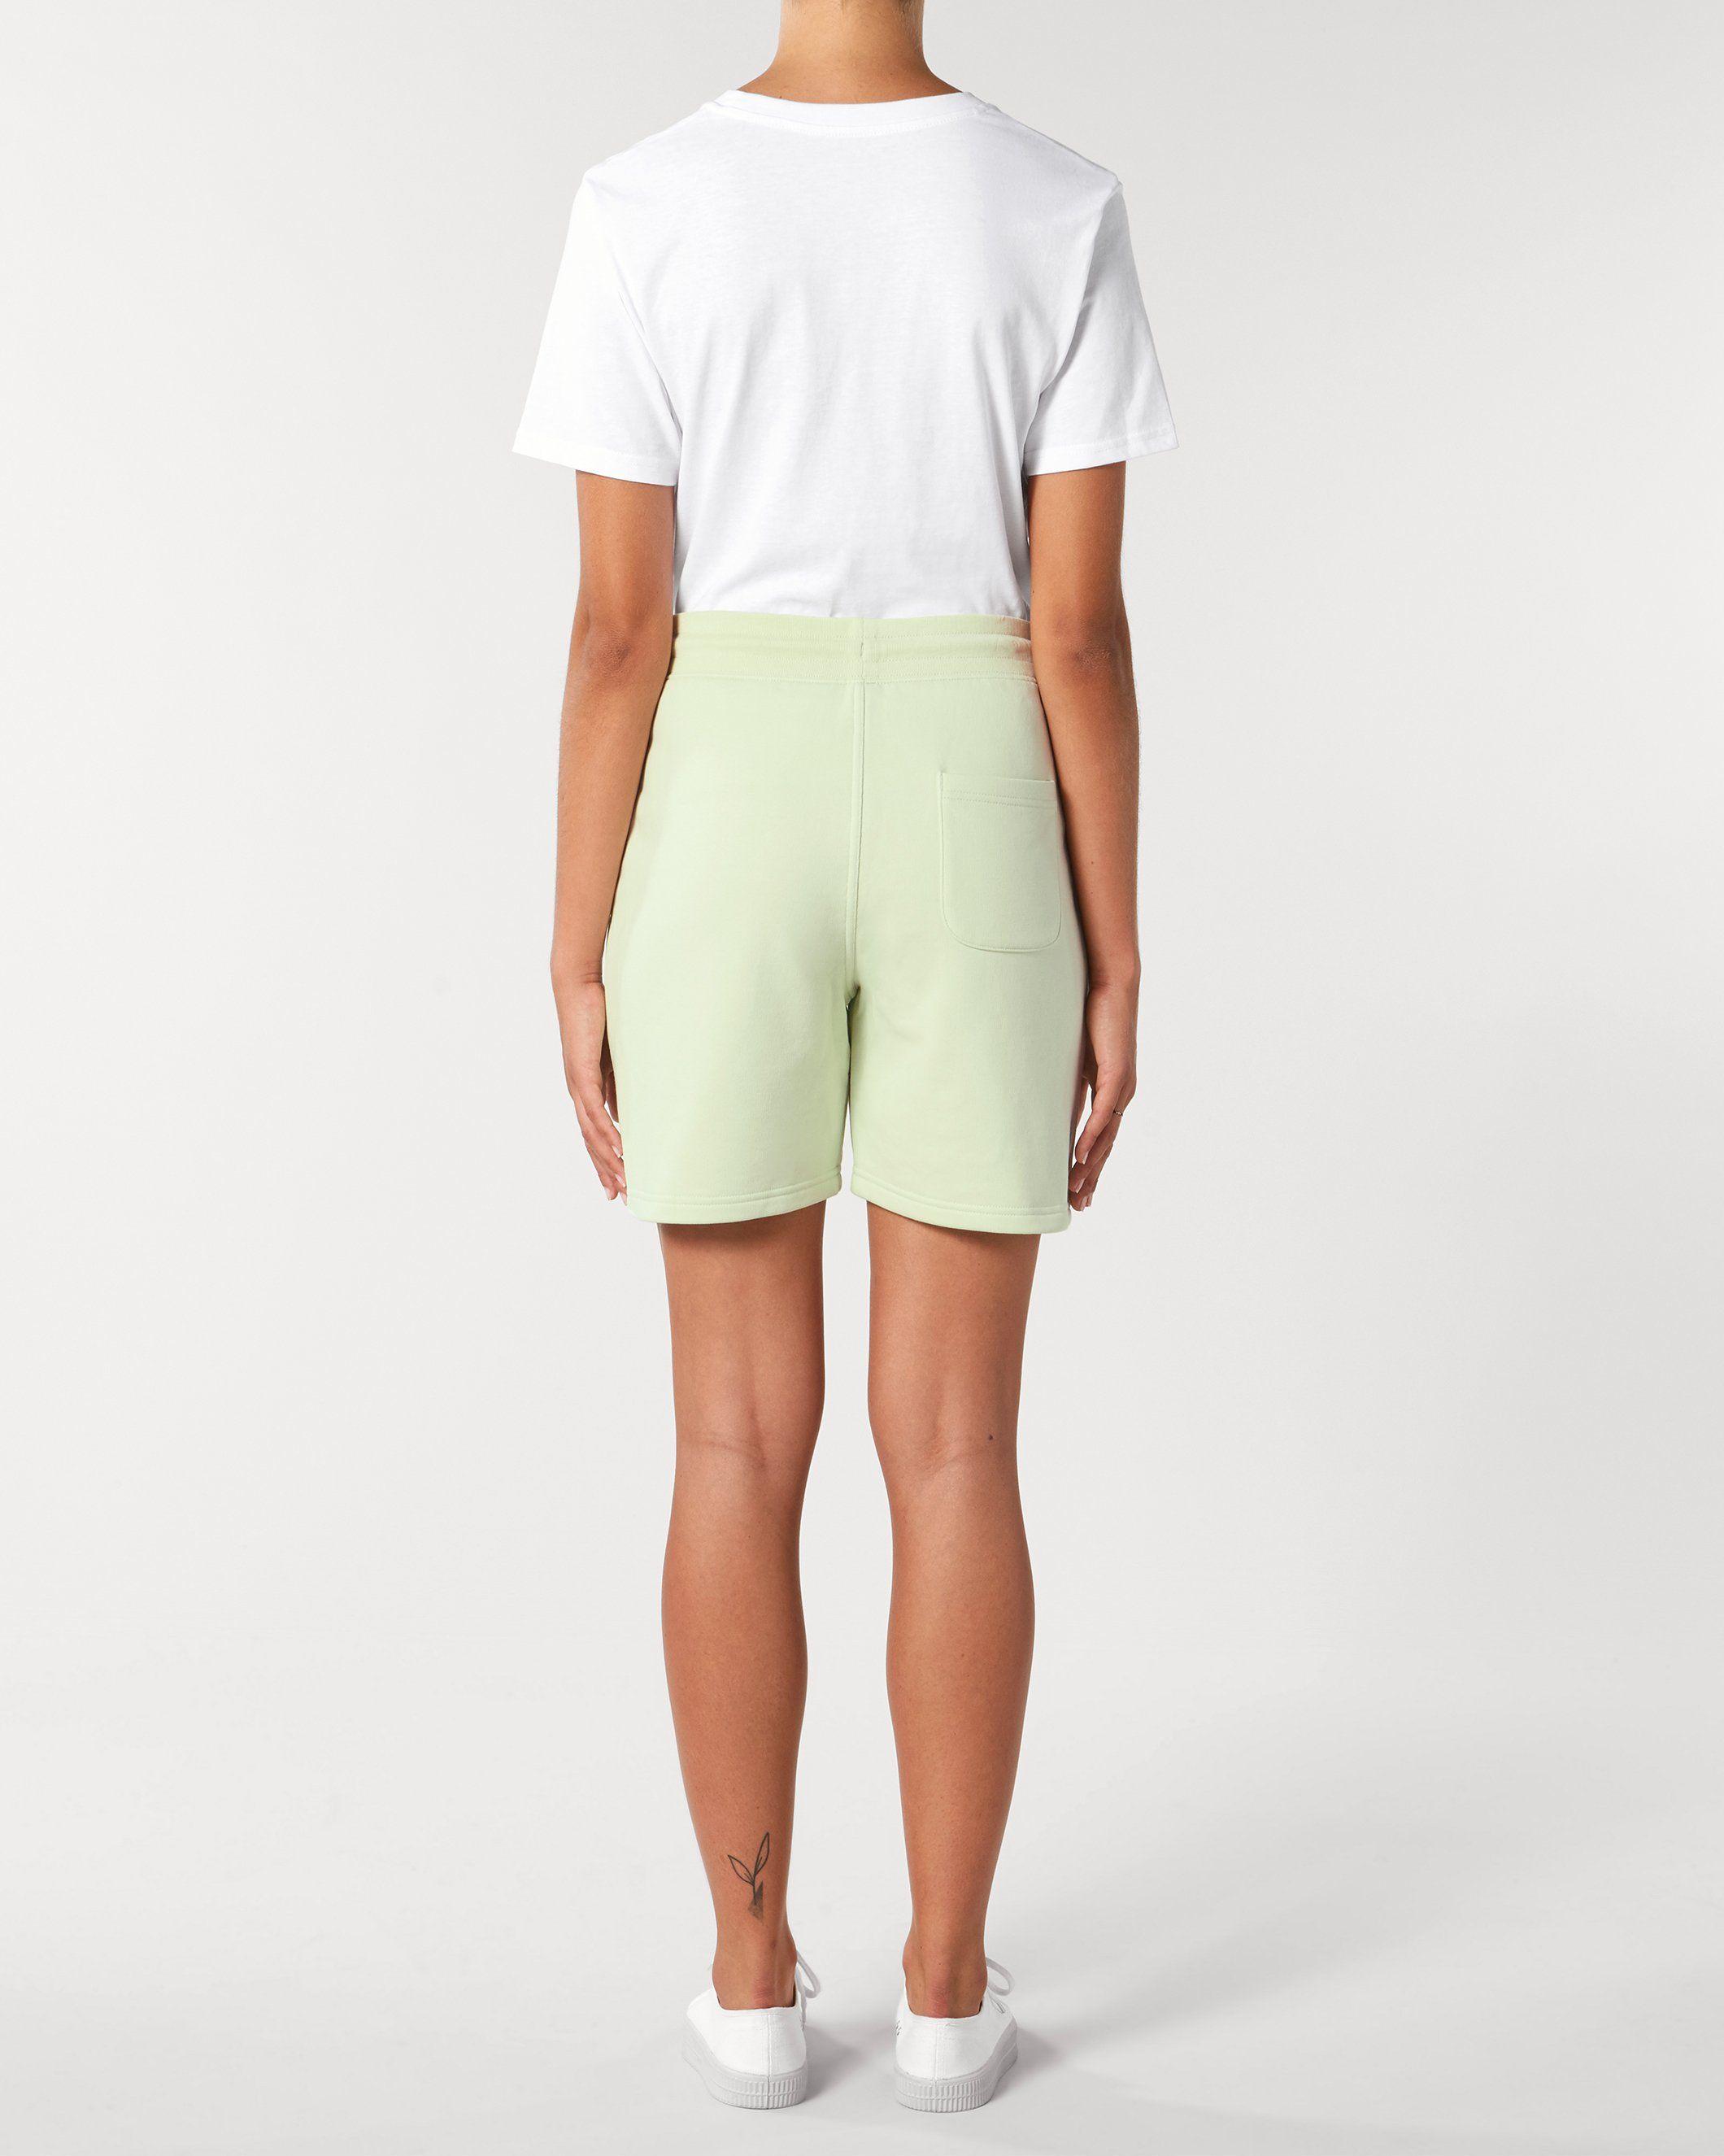 Vayu Unisex Jogger Shorts in Green